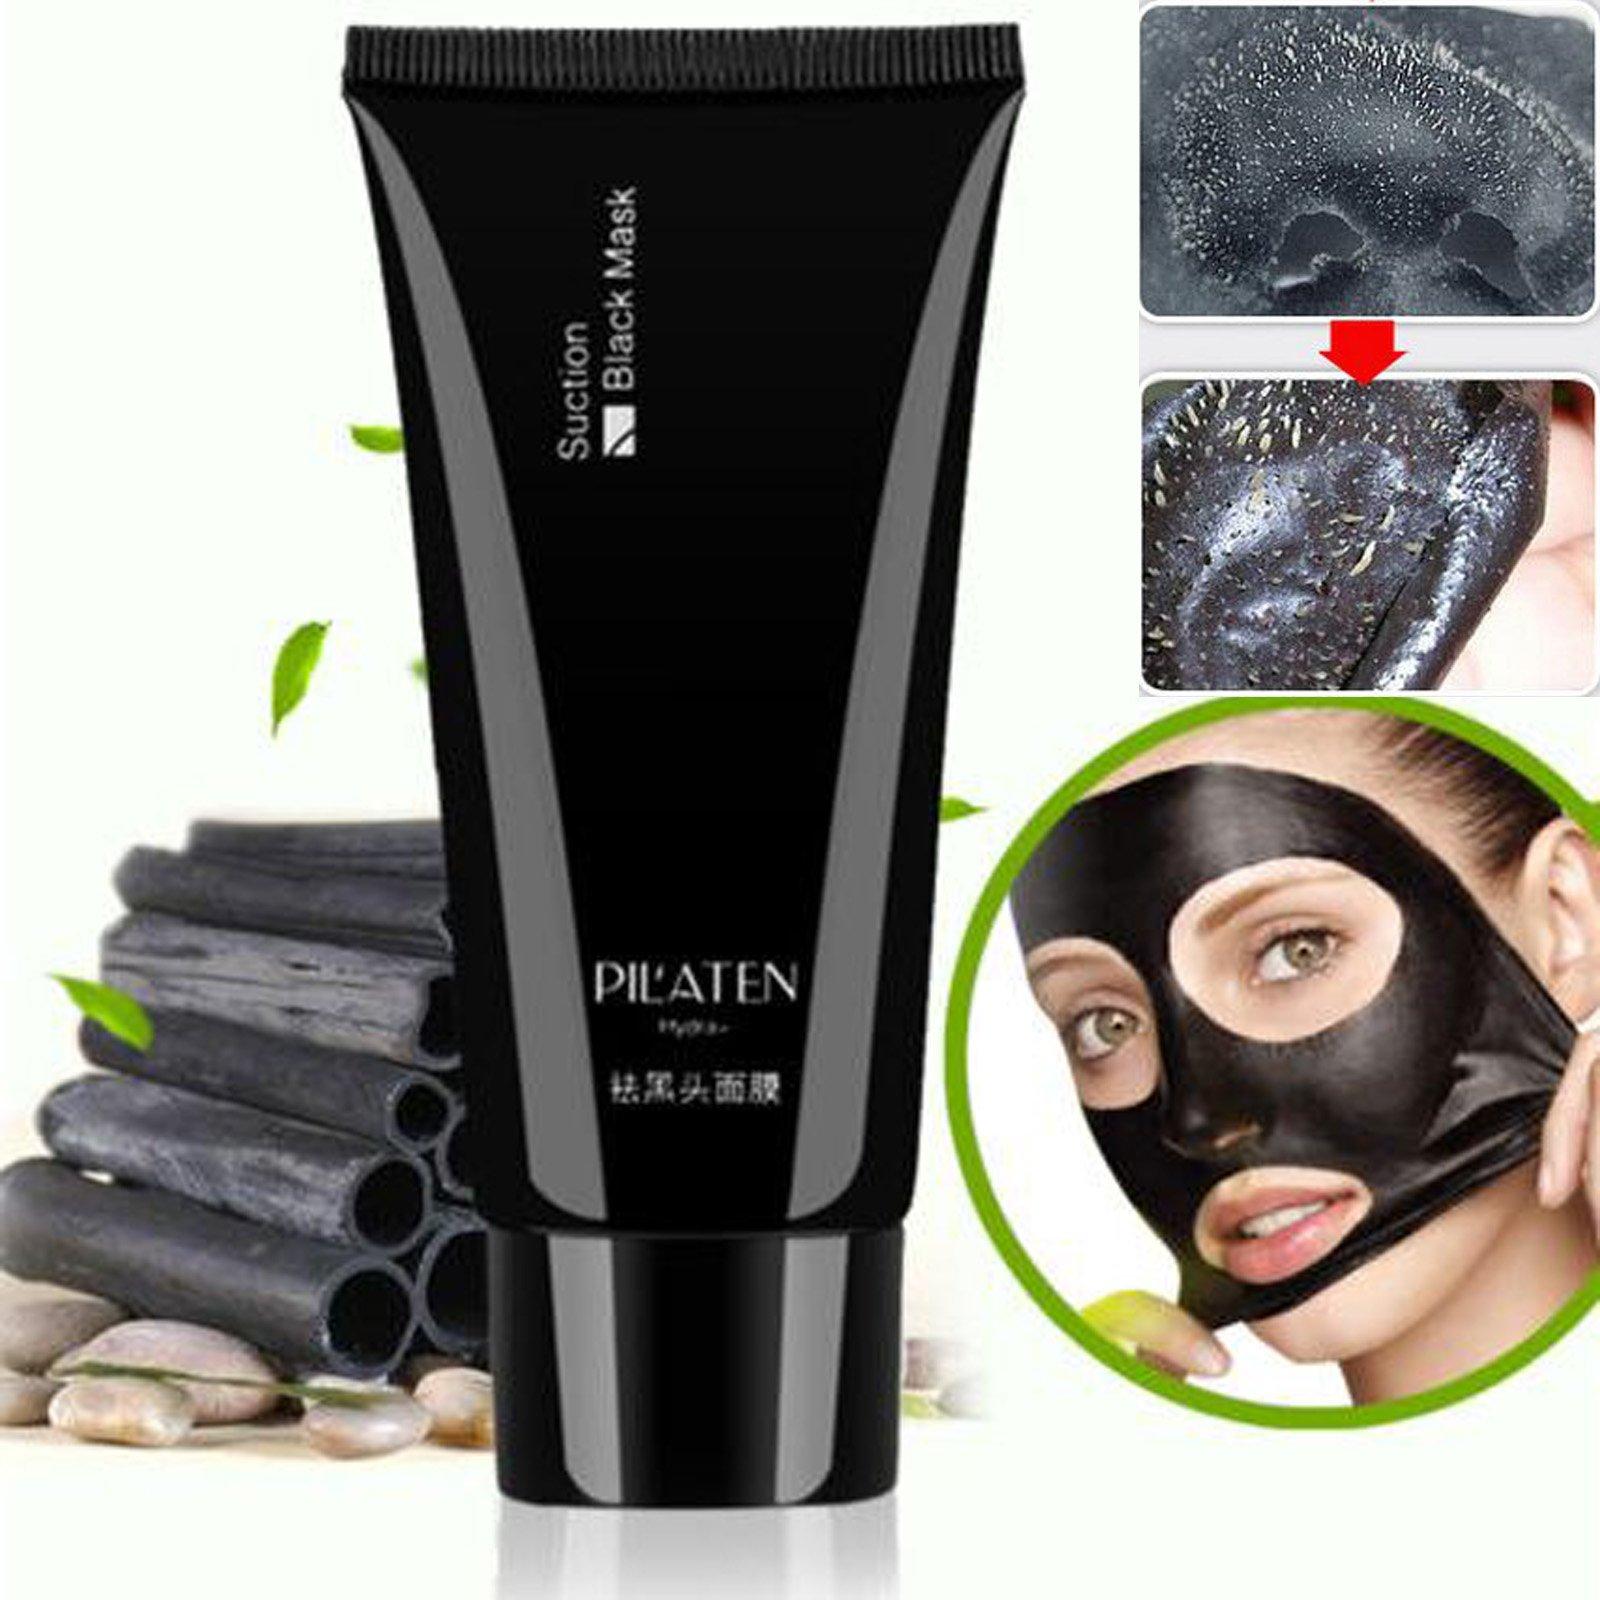 Baisidai PILATEN Facial Care Deep Cleansing Peel Off Removal Blackhead Nose Face Mask (1PCS)